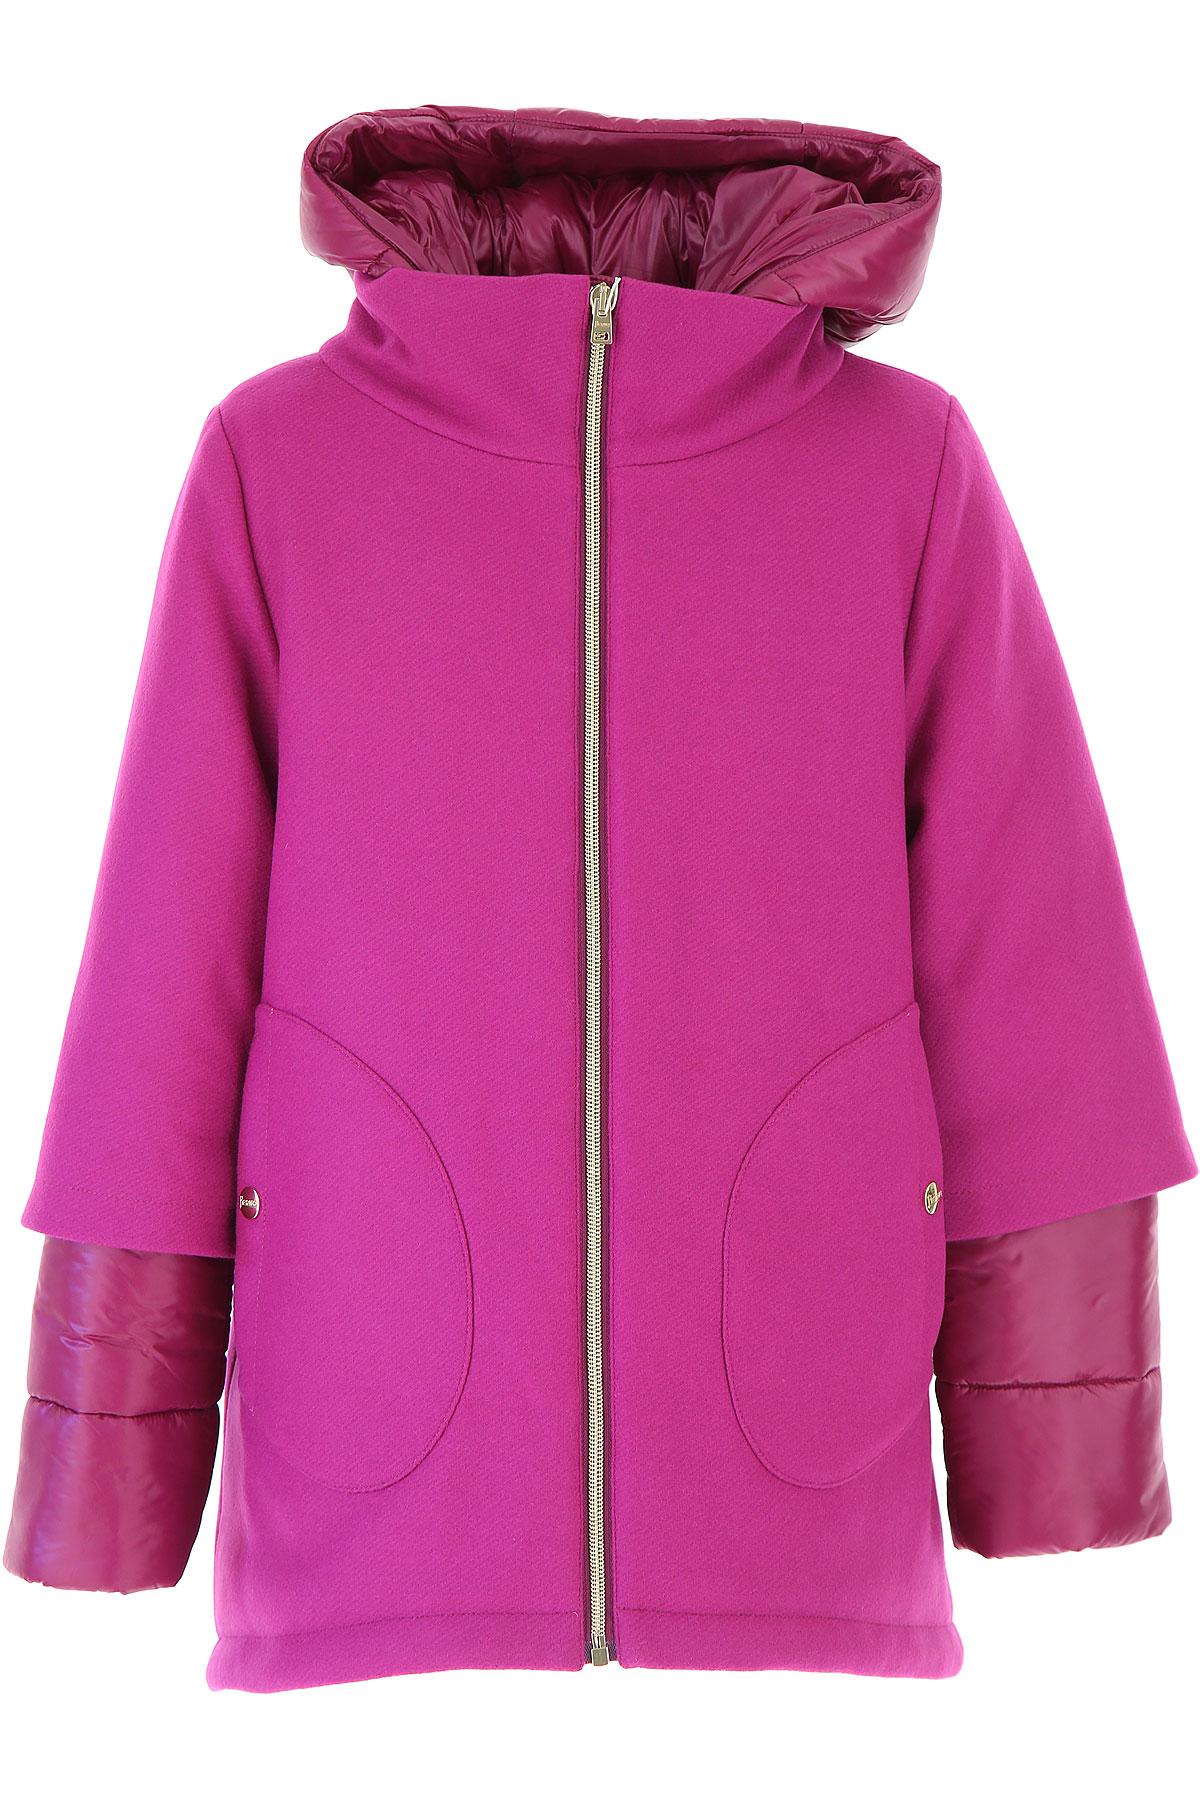 Image of Herno {DESIGNER} Kids Coat for Girls, Fuchsia, Wool, 2017, 10Y 14Y 8Y